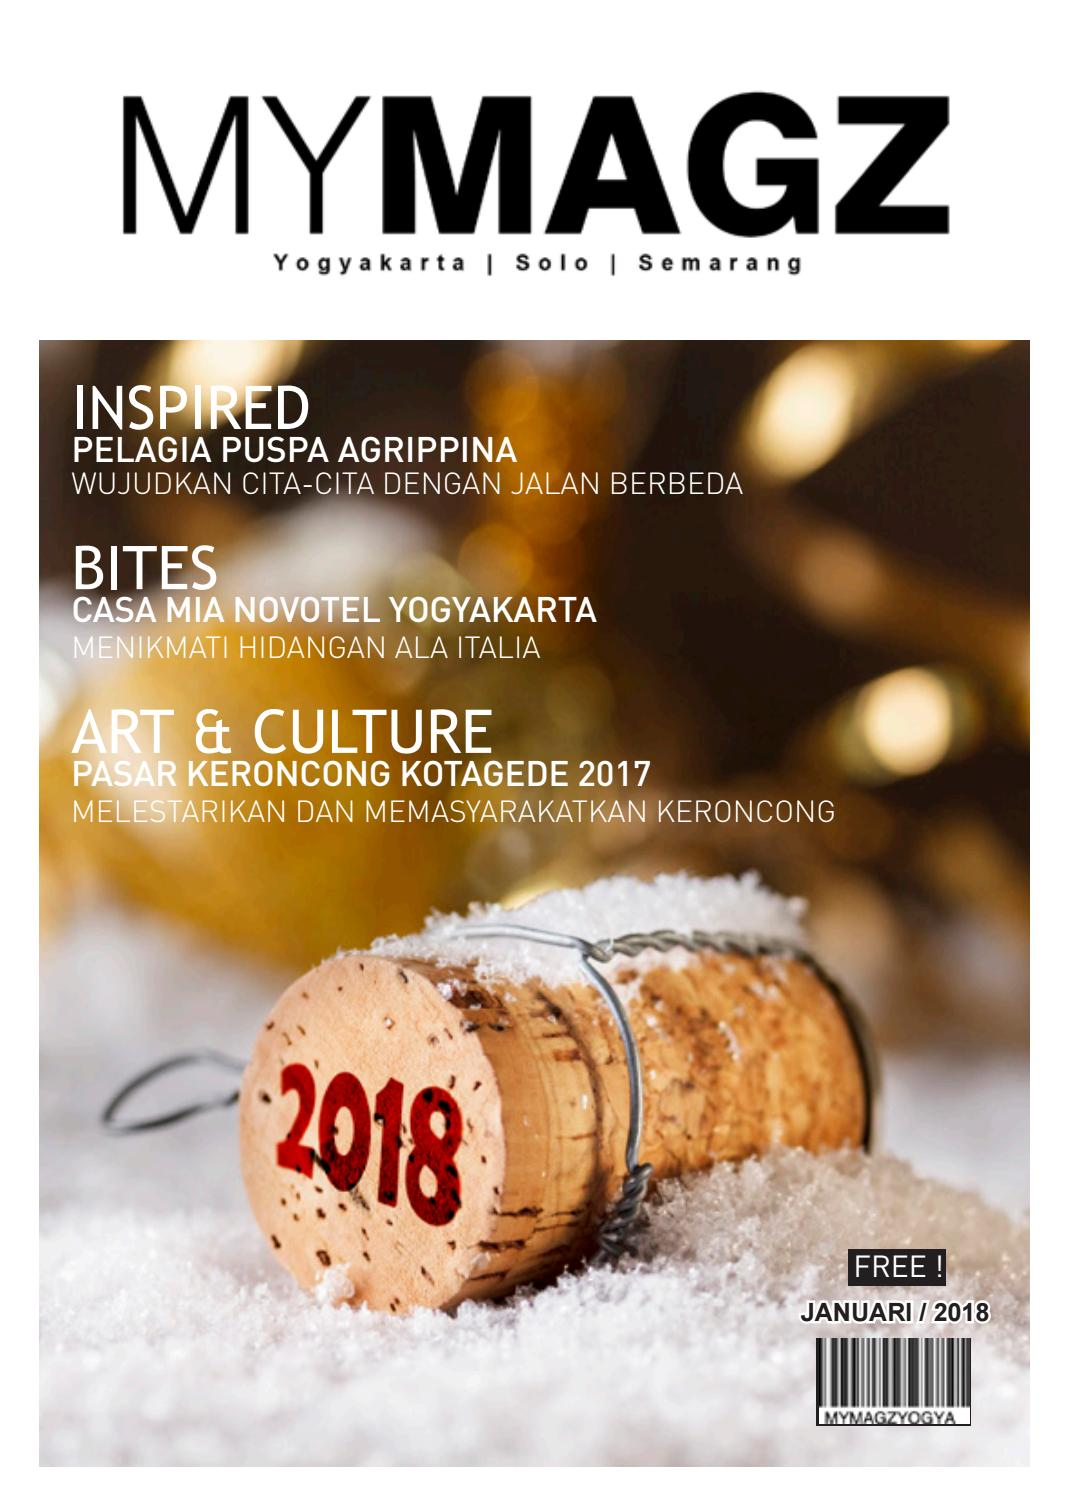 Mymagz Januari 2018 By Mixmedia Bali Issuu Produk Ukm Bumn Batik Tulis Warna Alam Ra Ampamp